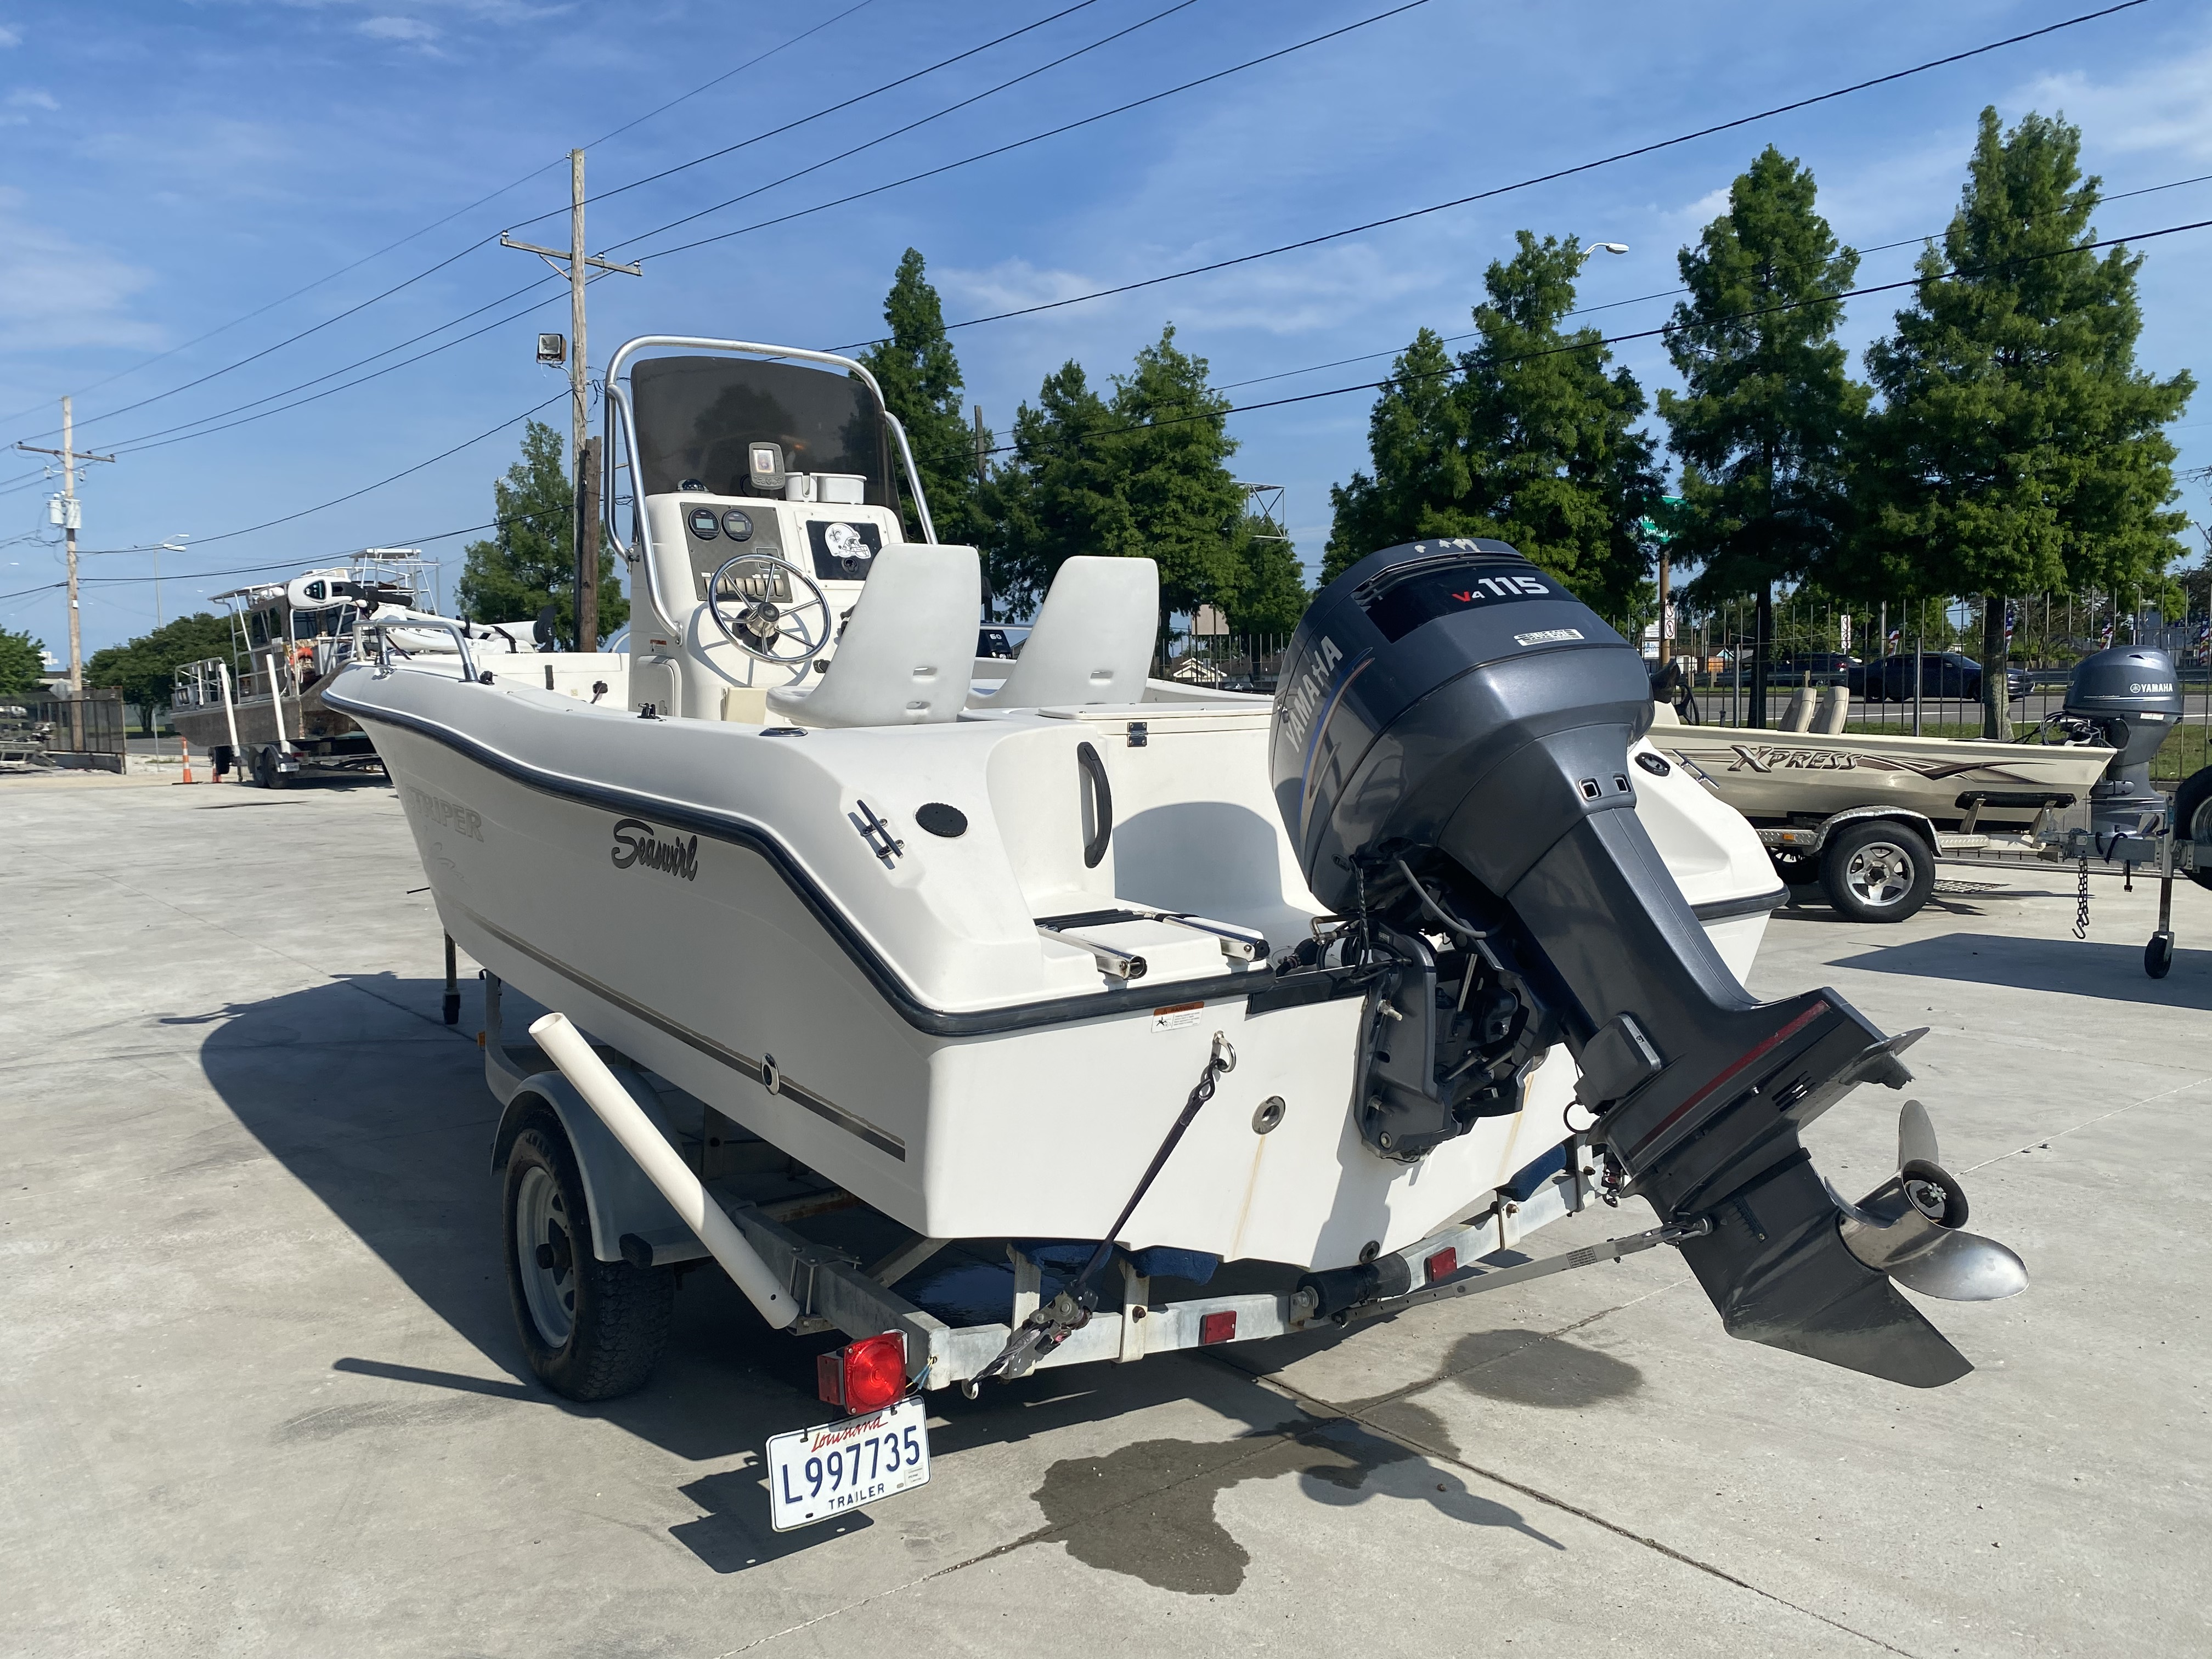 2004 Seaswirl boat for sale, model of the boat is 186 Striper & Image # 9 of 12